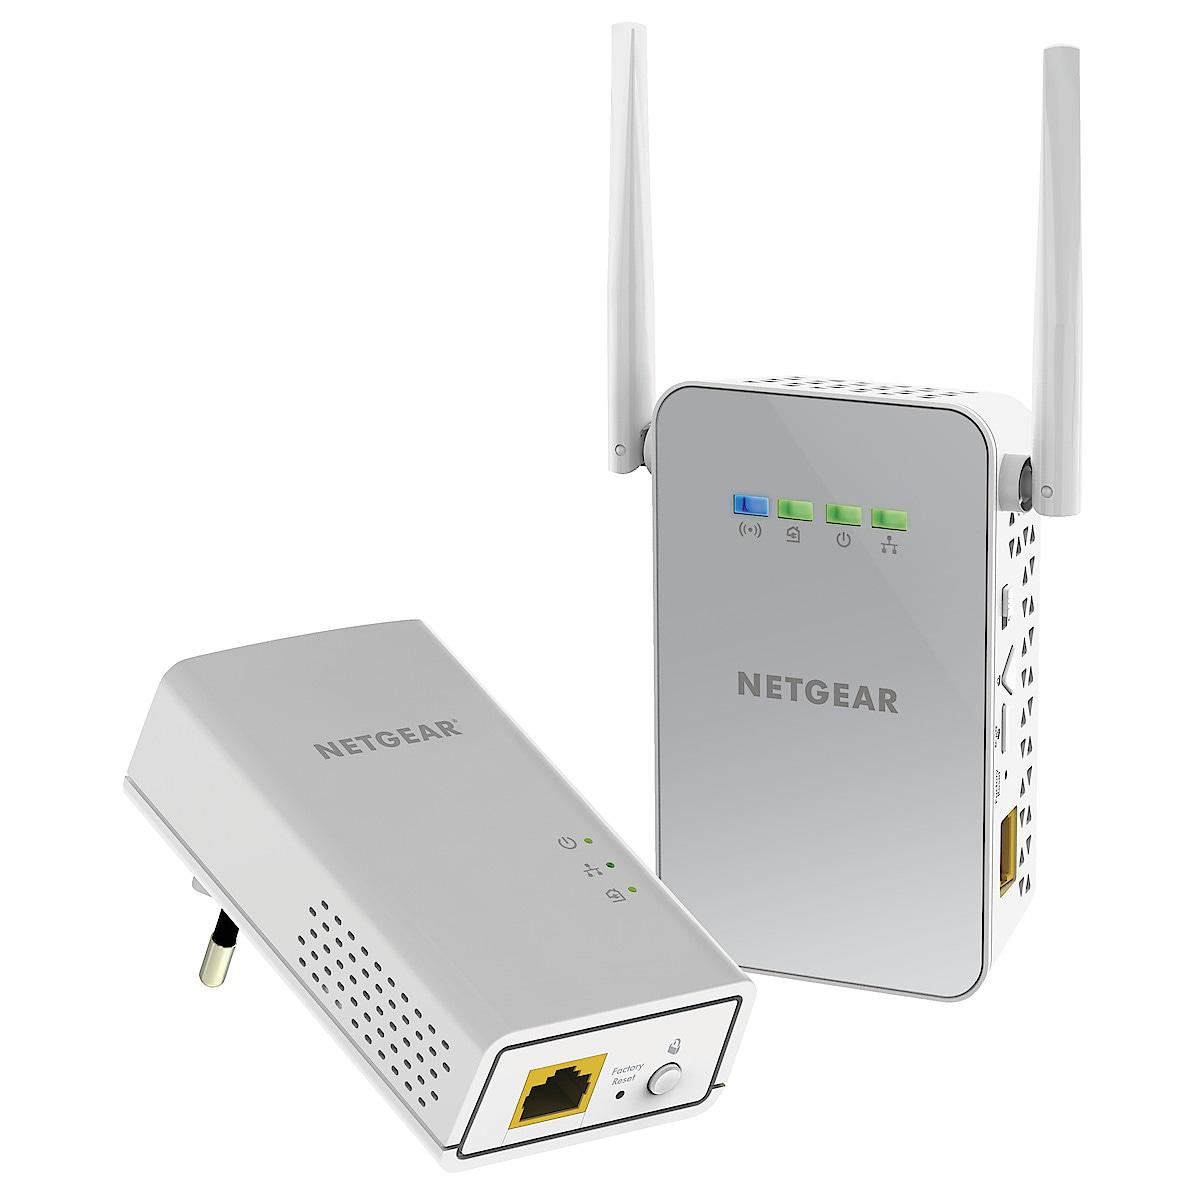 Netgear PLW1000 HomePlug